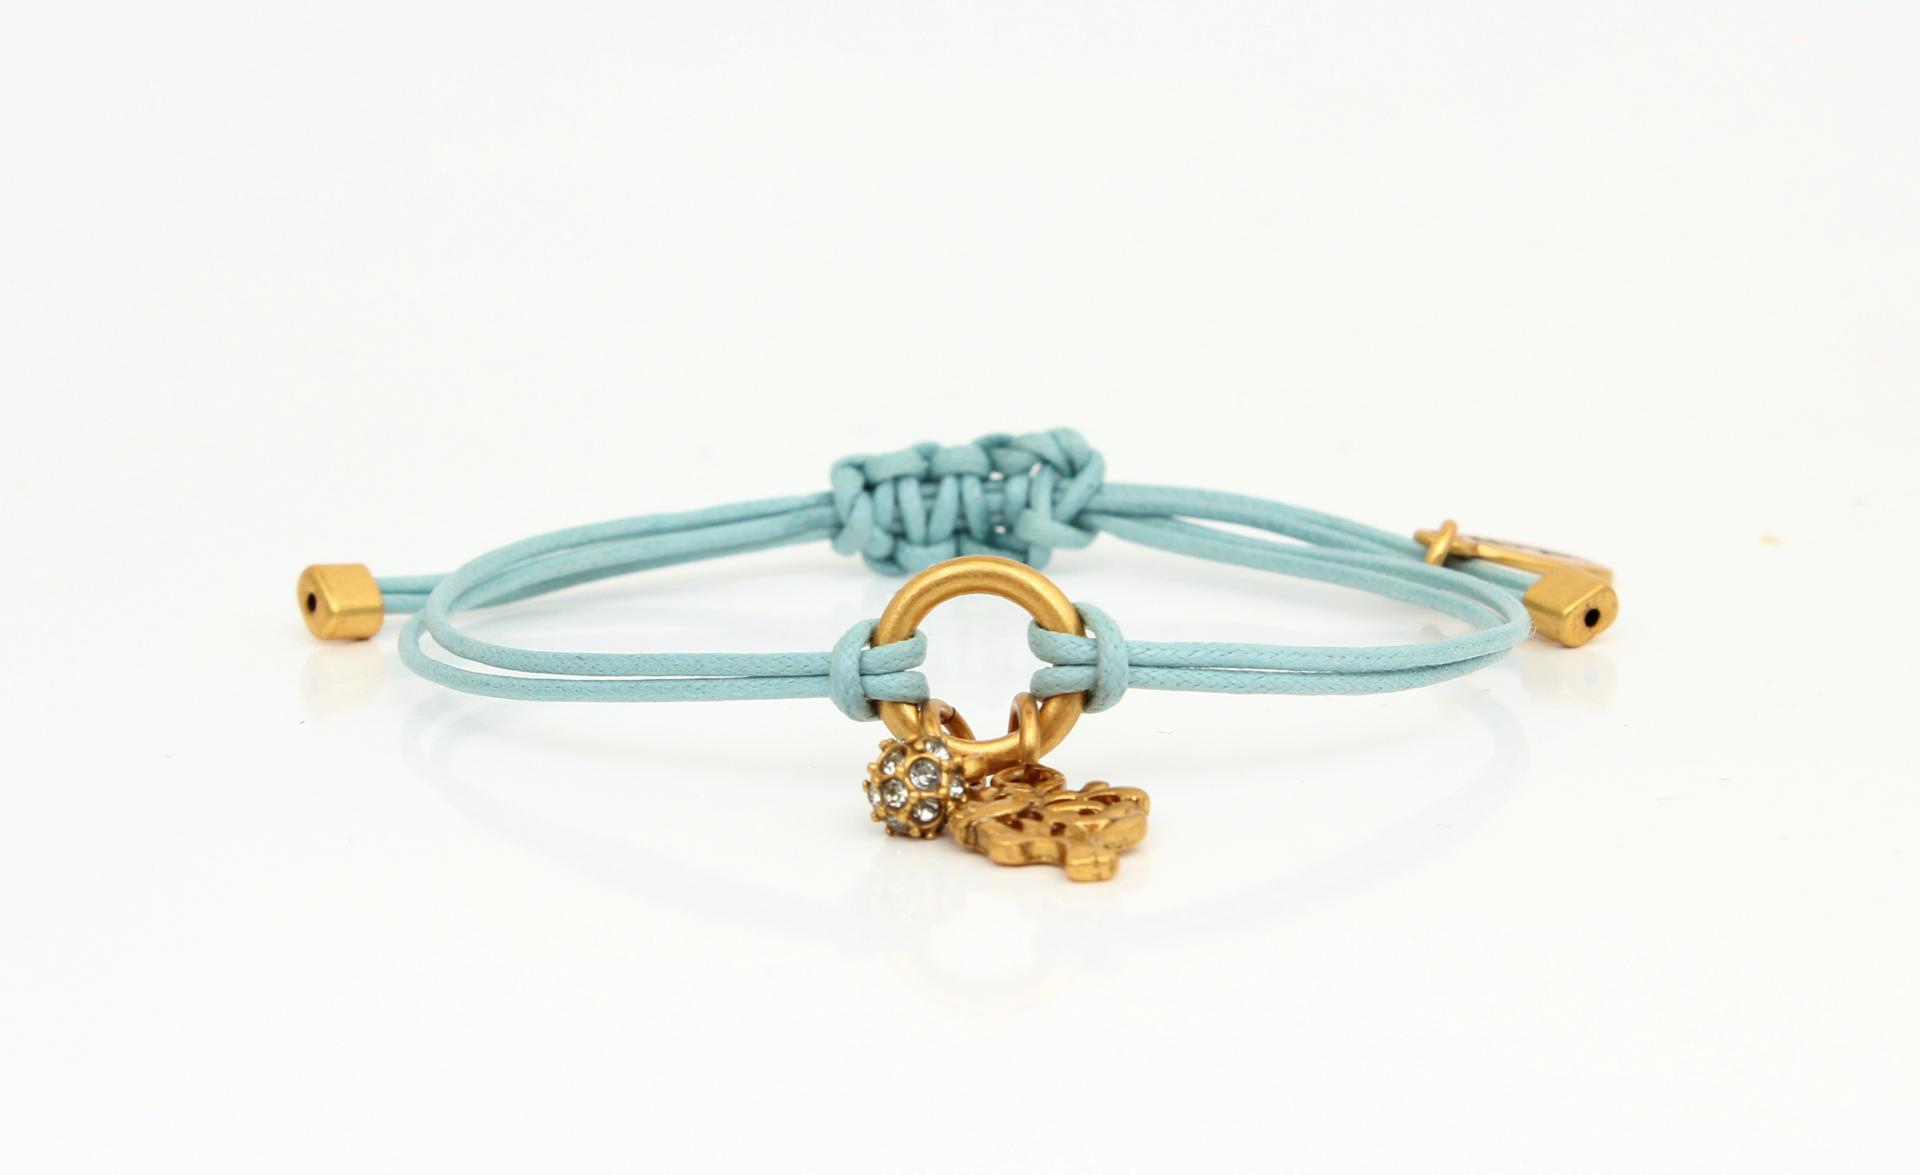 HULTQUIST Náramek Tree/ball gold, modrá barva B291007314E